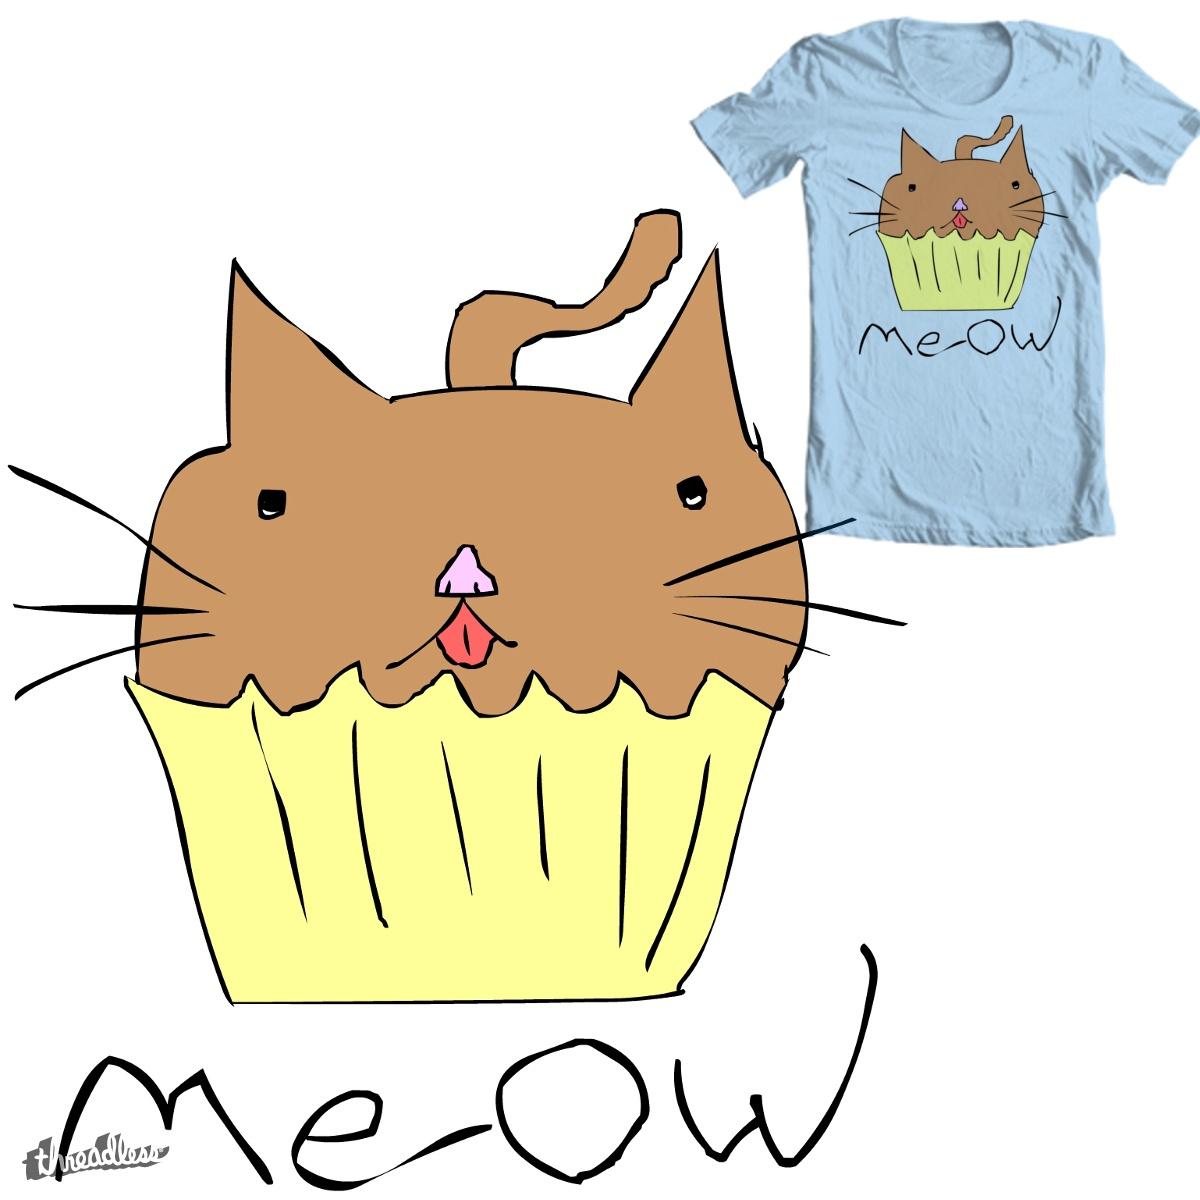 Cupcake Cat by blackblackocean on Threadless